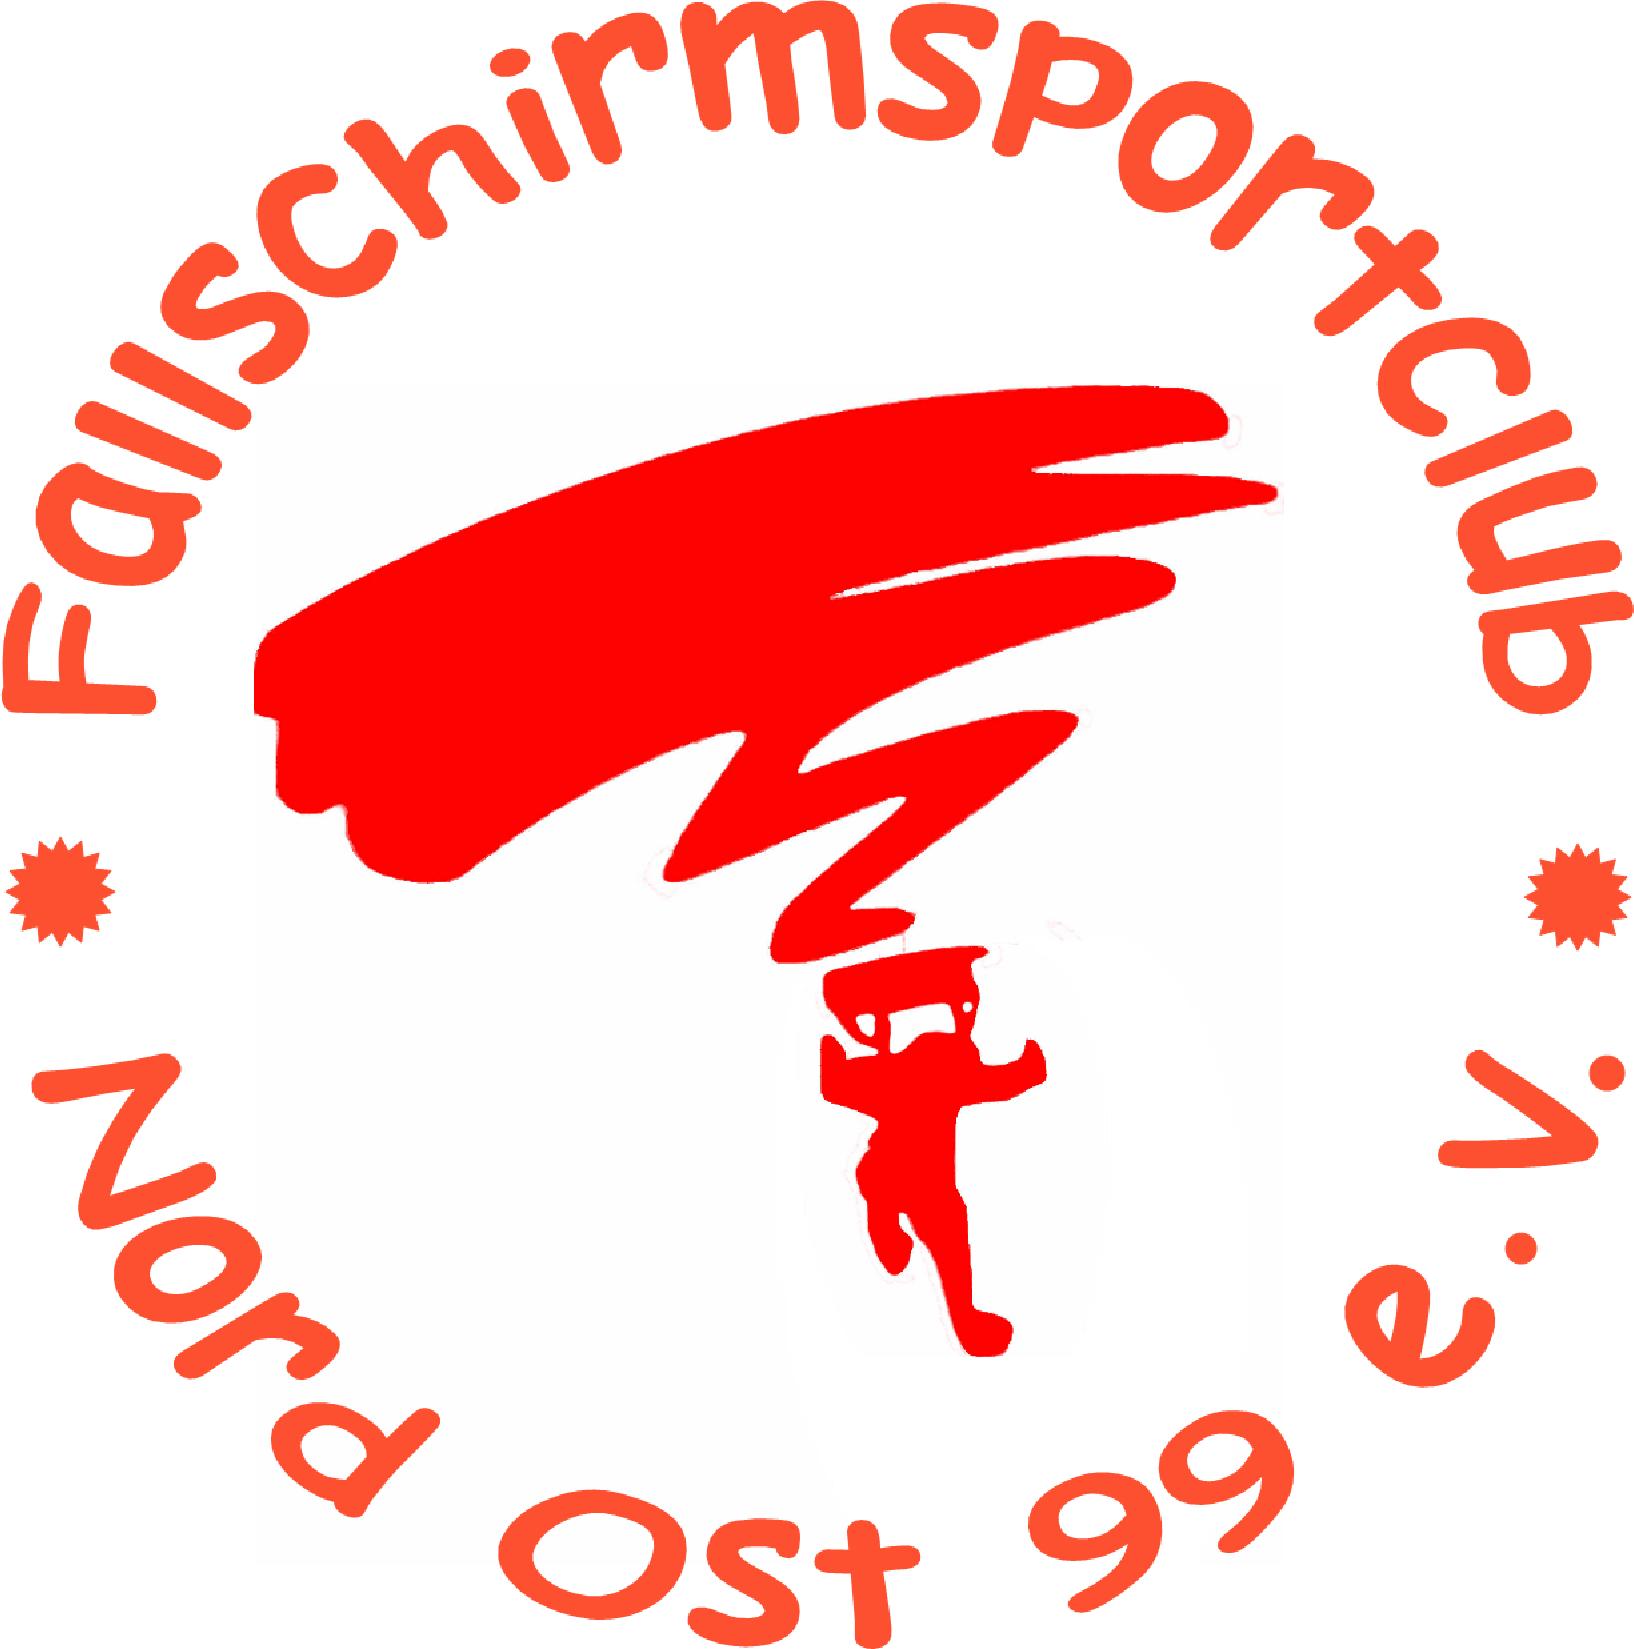 Fallschirmsportclub Nord Ost 99 e.V.